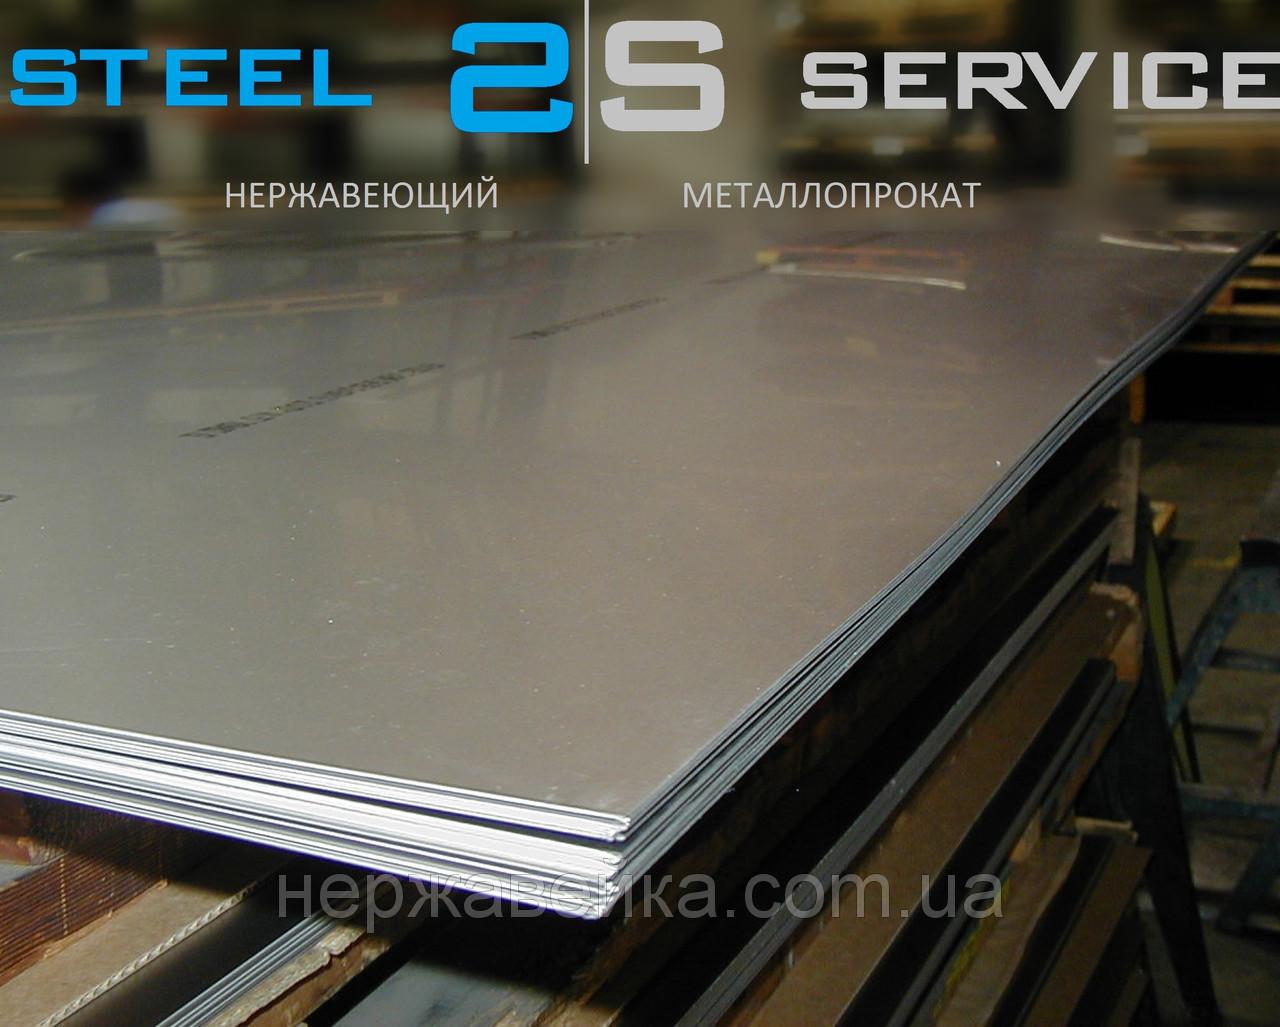 Нержавейка лист 1х1000х2000мм  AISI 316Ti(10Х17Н13М2Т) BA - зеркало,  кислотостойкий